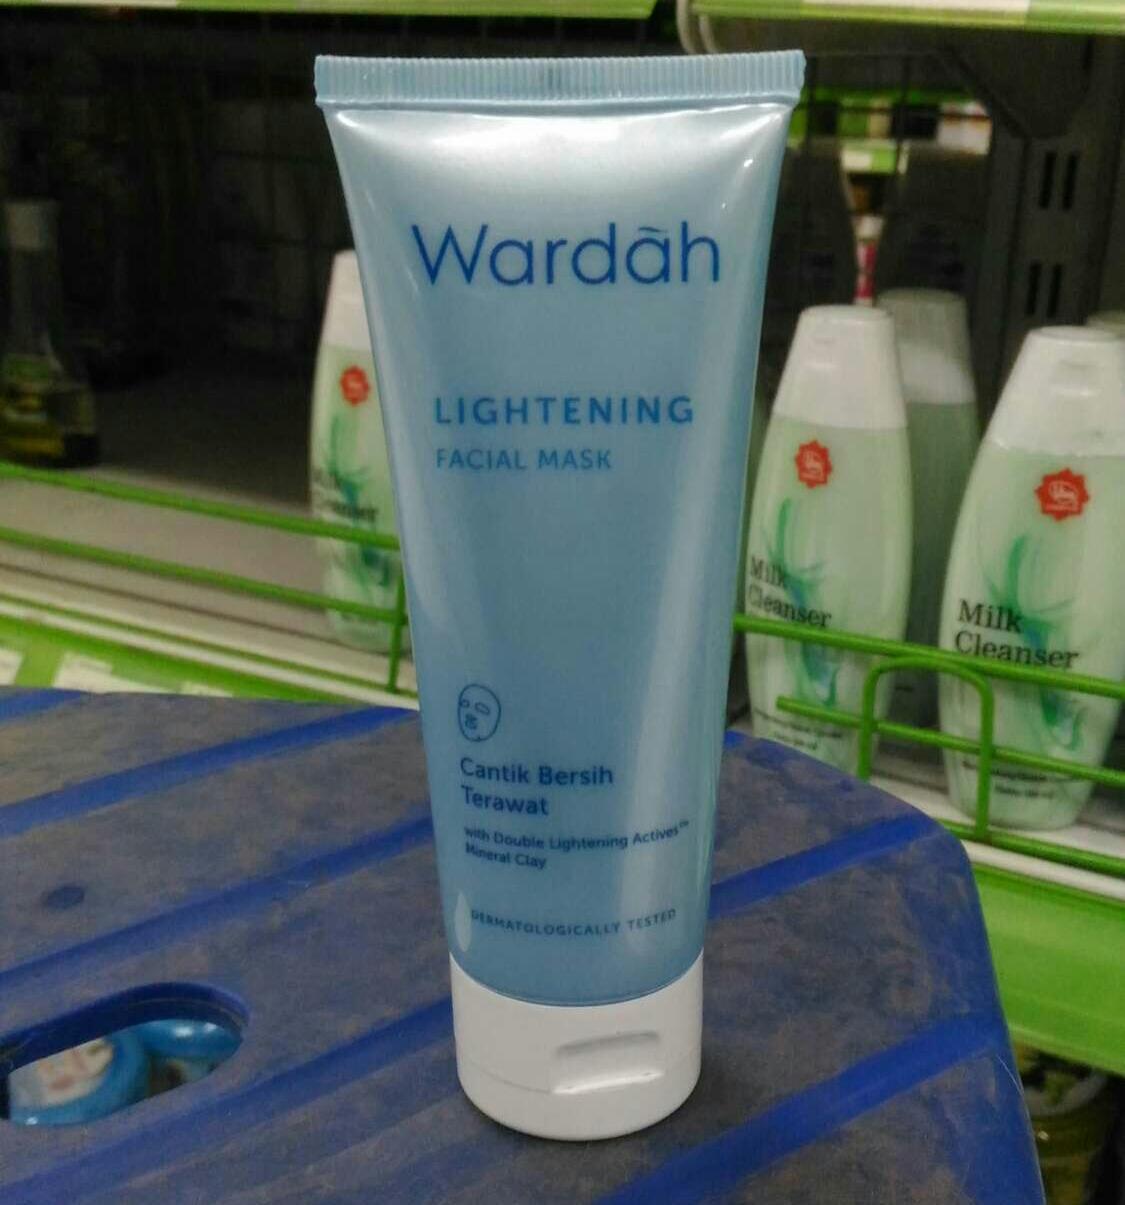 Wardah Lightening Face Mask 60 Ml Daftar Harga Terbaru Dan Facial